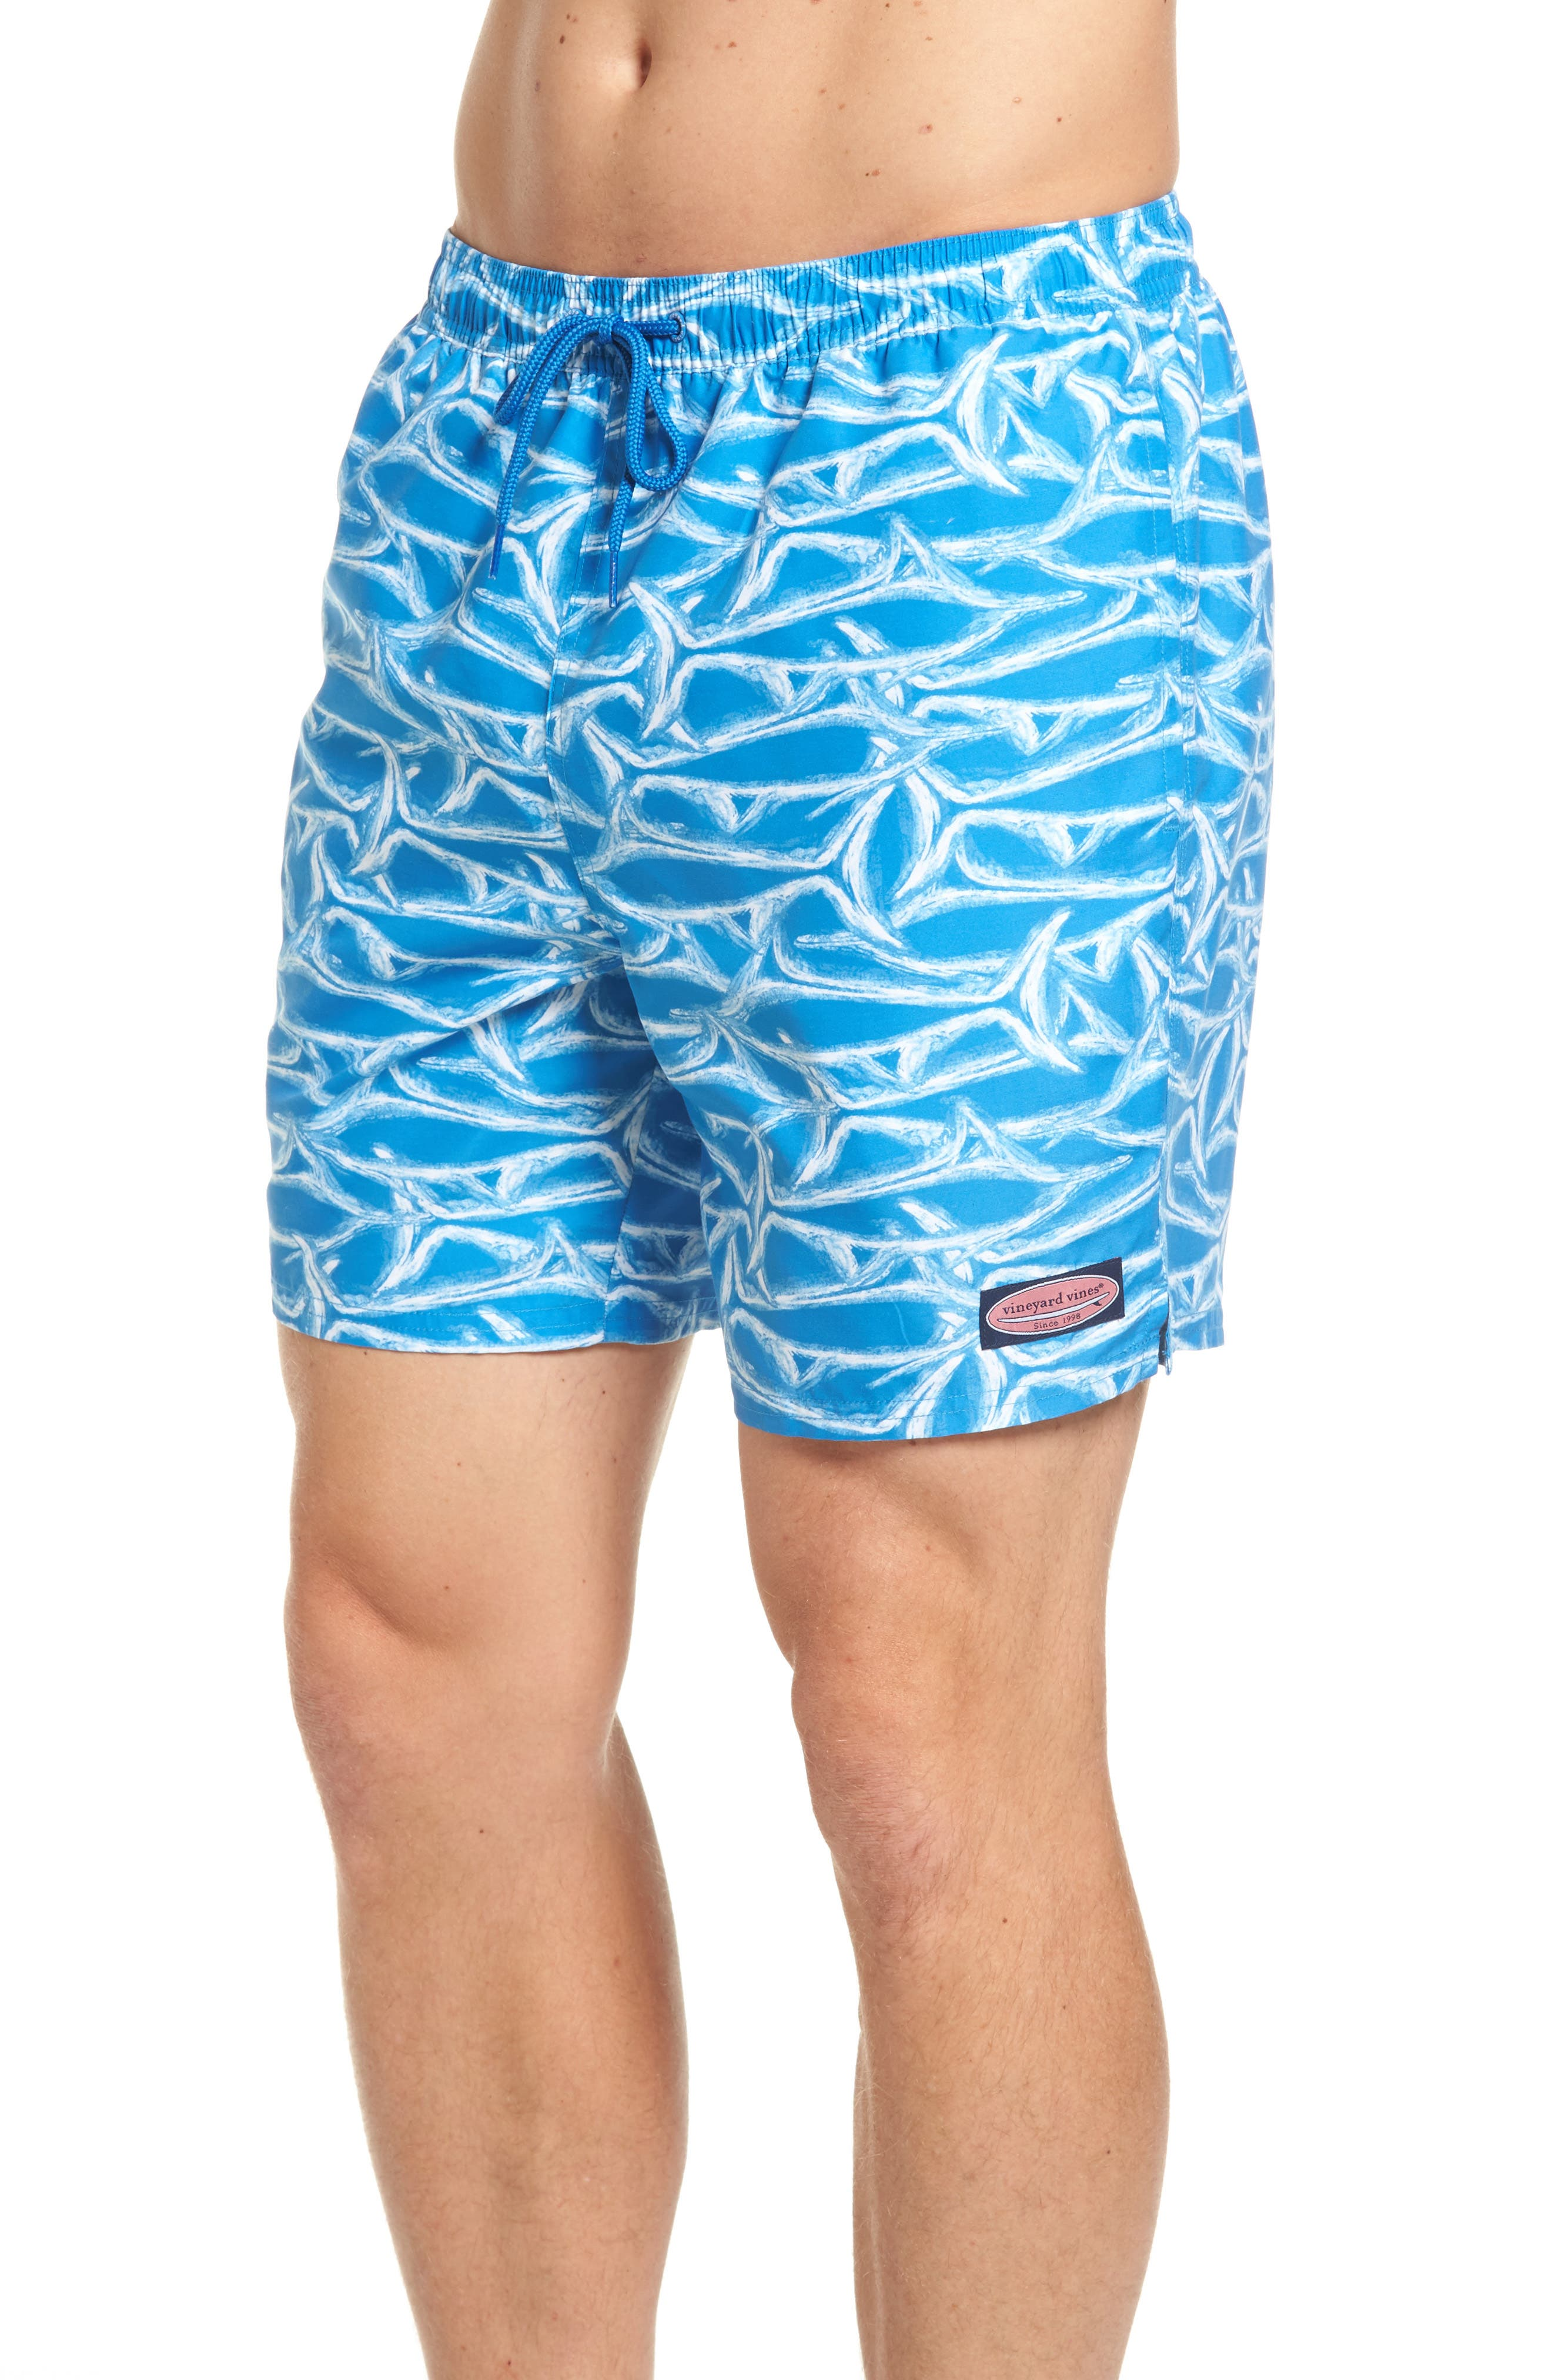 Brushed Marlin Chappy Swim Trunks,                             Alternate thumbnail 3, color,                             Hull Blue